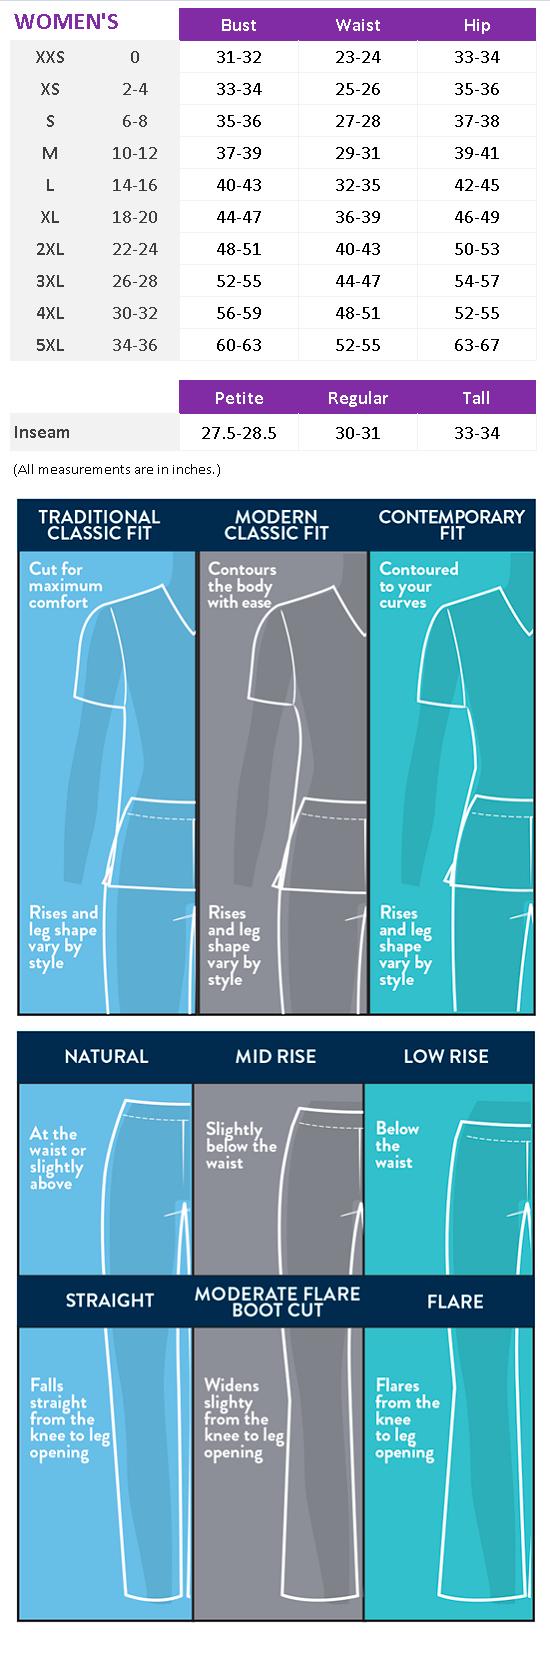 Dickies Xtreme 6 Pocket Rib Knit Waistband Pant in Reg, tall and Petite - DK020